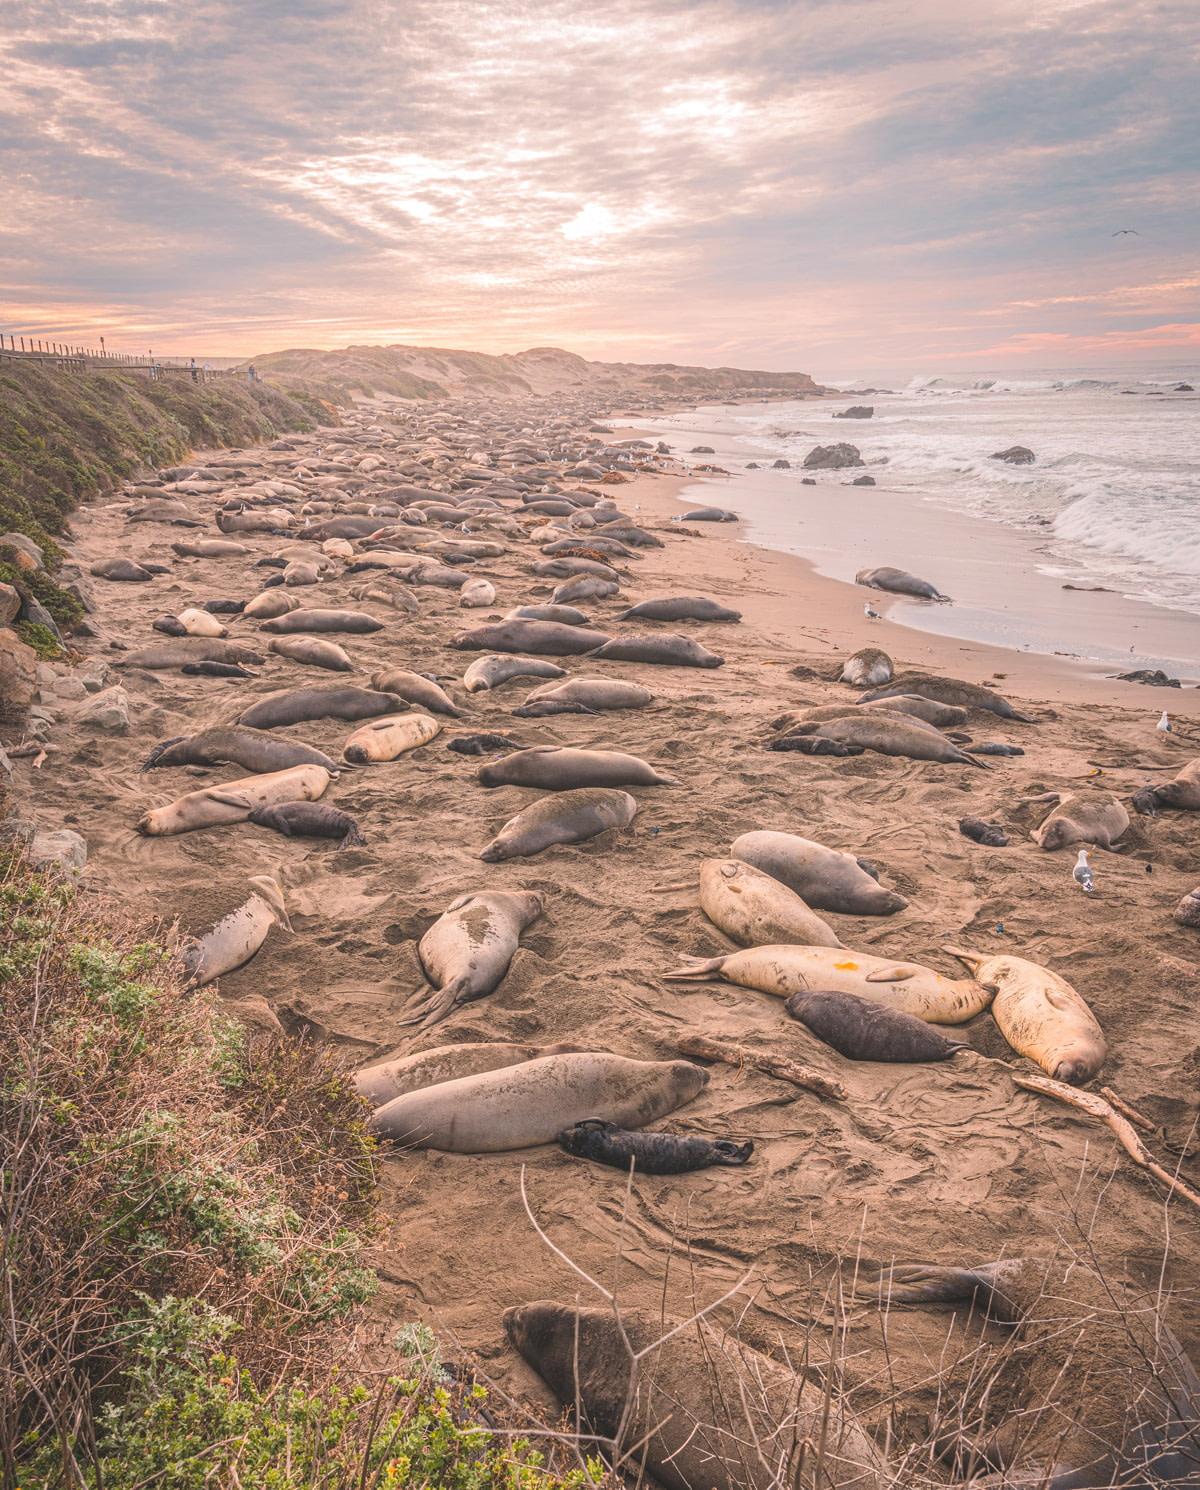 Elephant seals on the coast of California